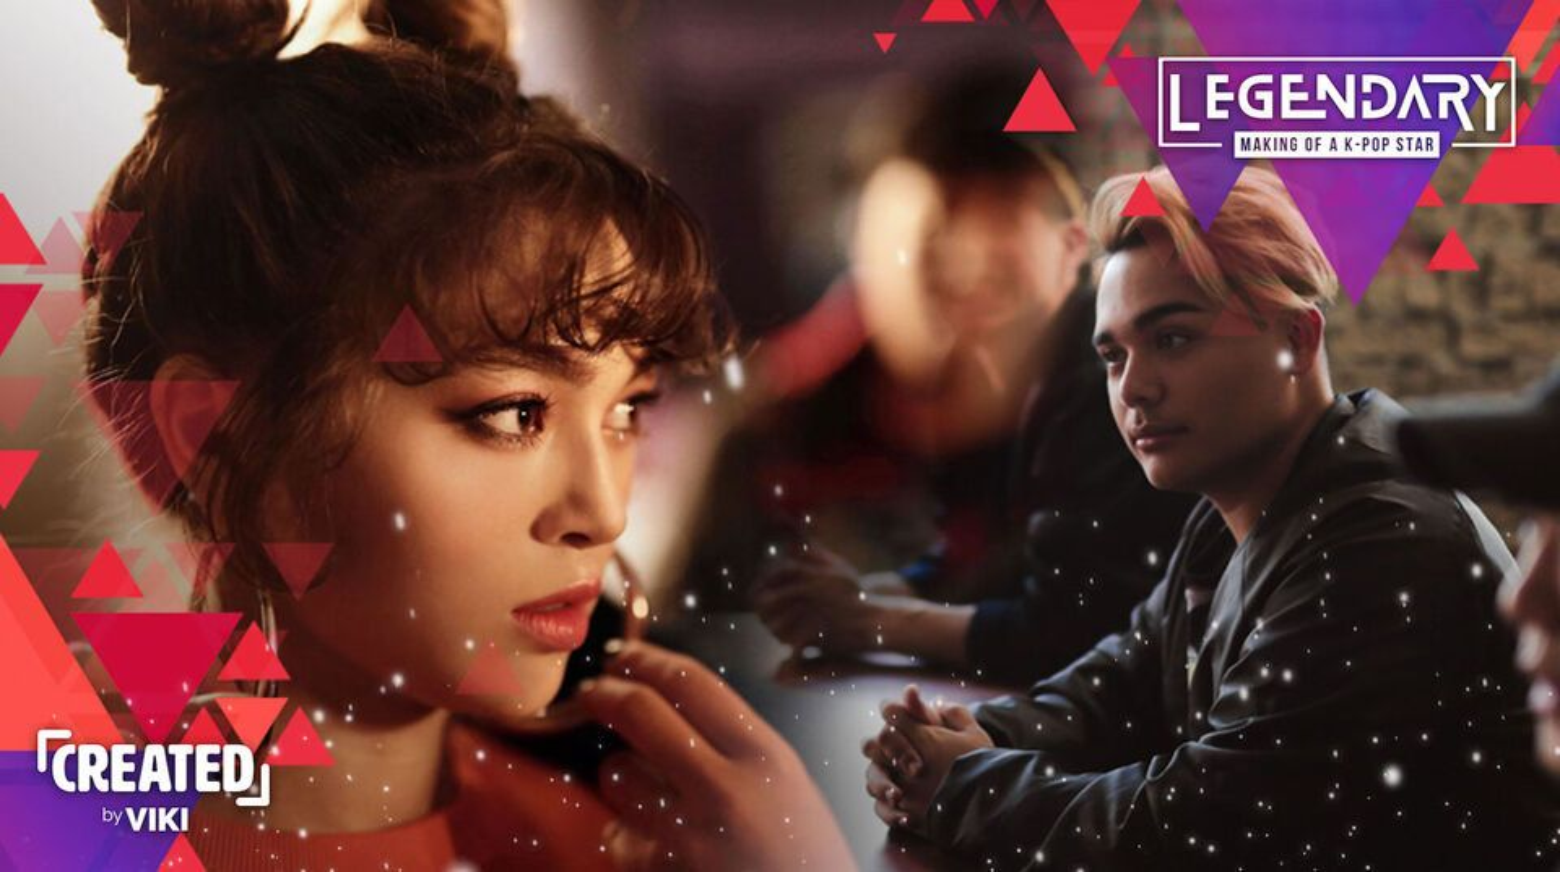 LEGENDARY: Making of a K-Pop Star